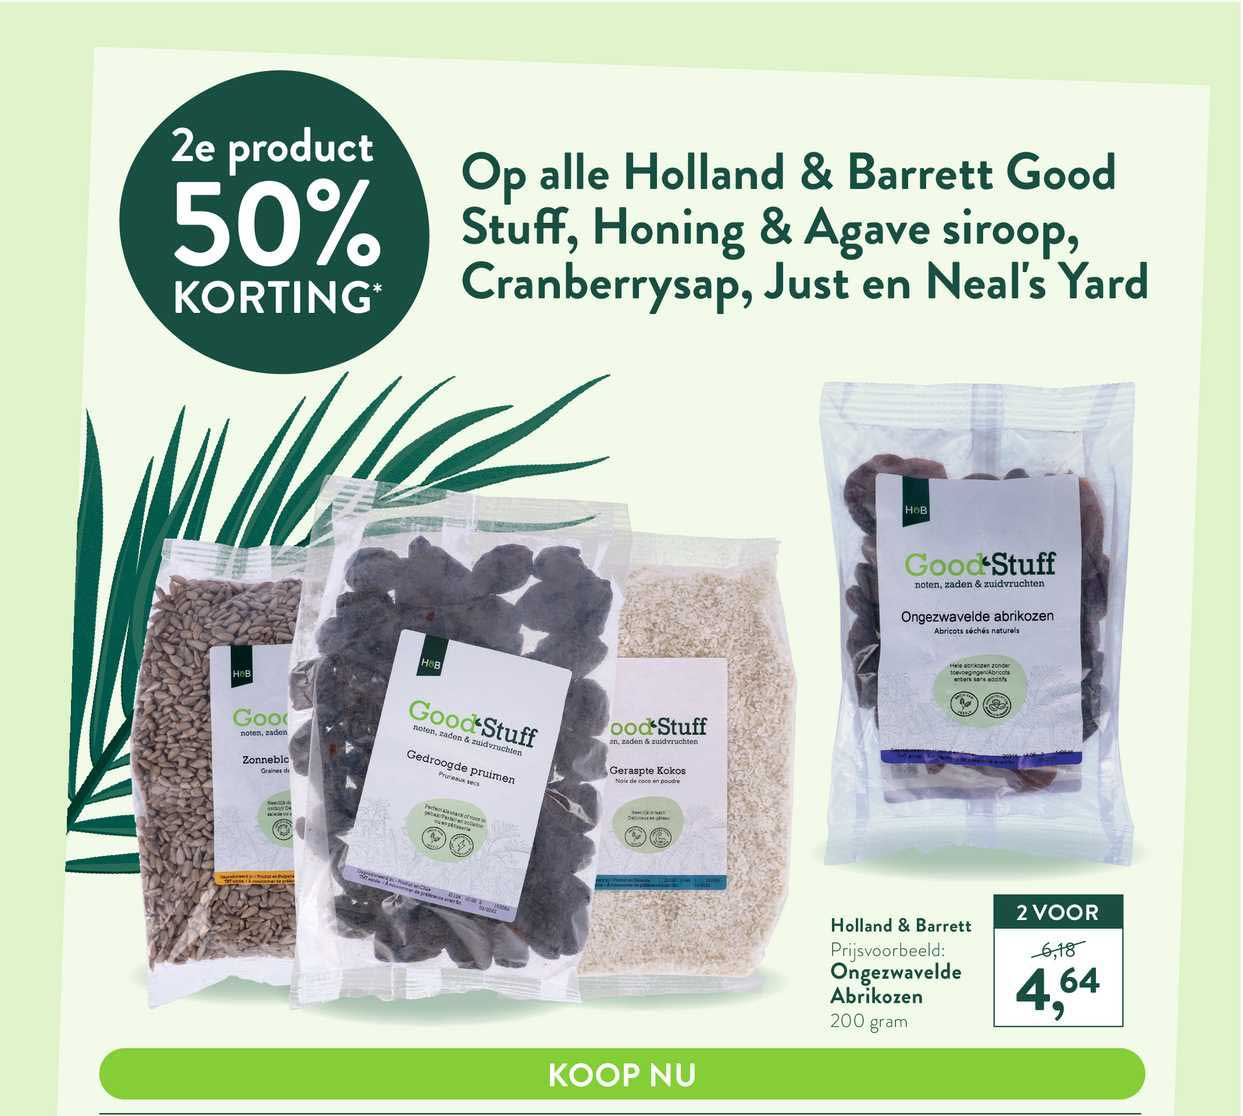 Holland & Barrett Op Alle Holland & Barrett Good Stuff, Honing & Agave Siroop, Cranberrysap, Just En Neal's Yard 50% Korting